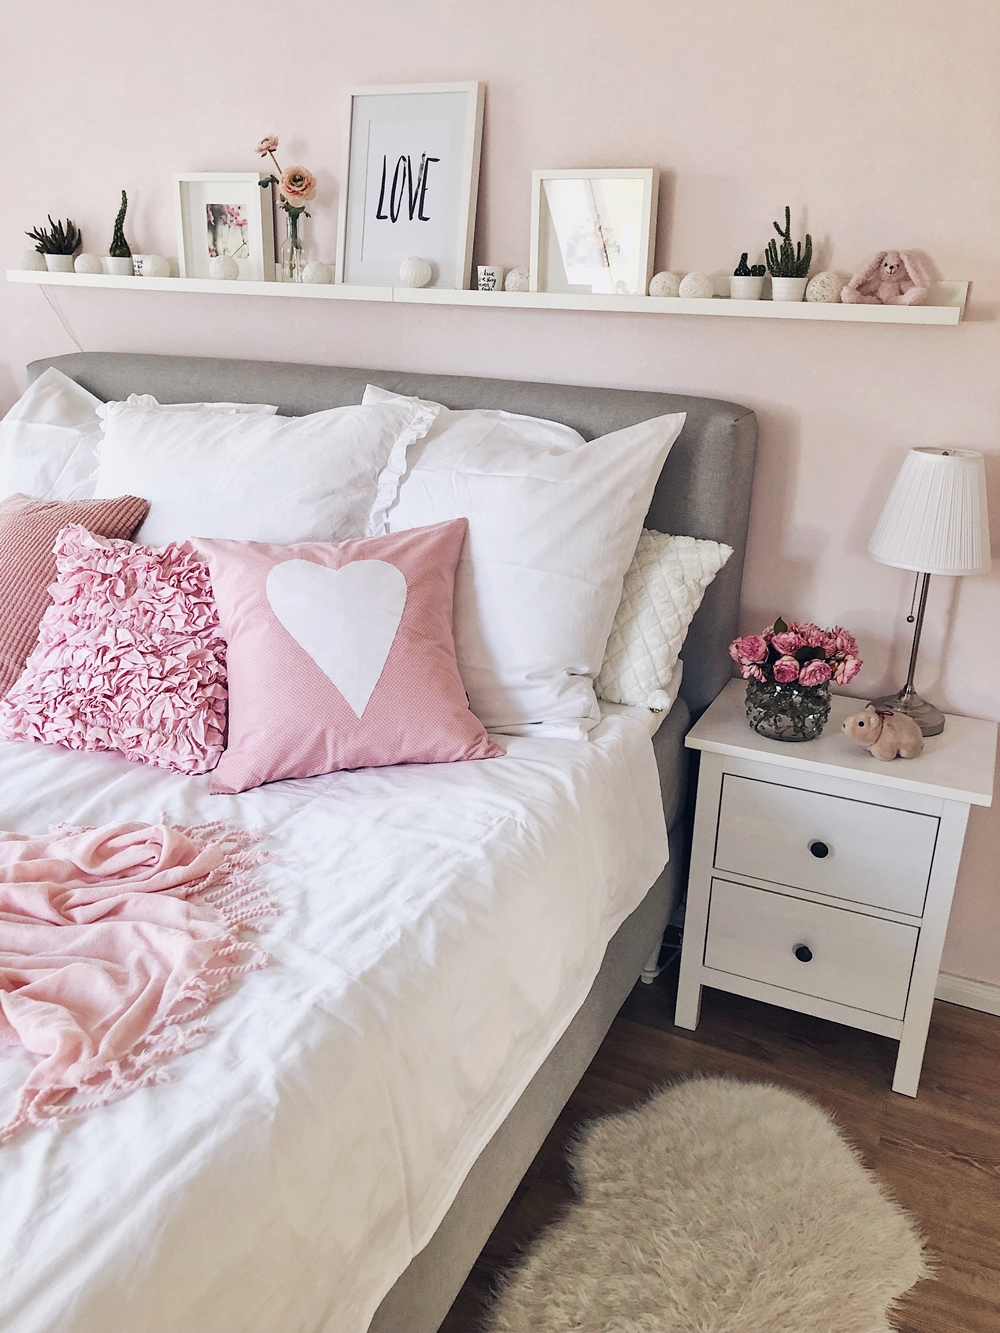 Schlafzimmer Update - Boxspringbett & Interior Fashionkitchen Ikea